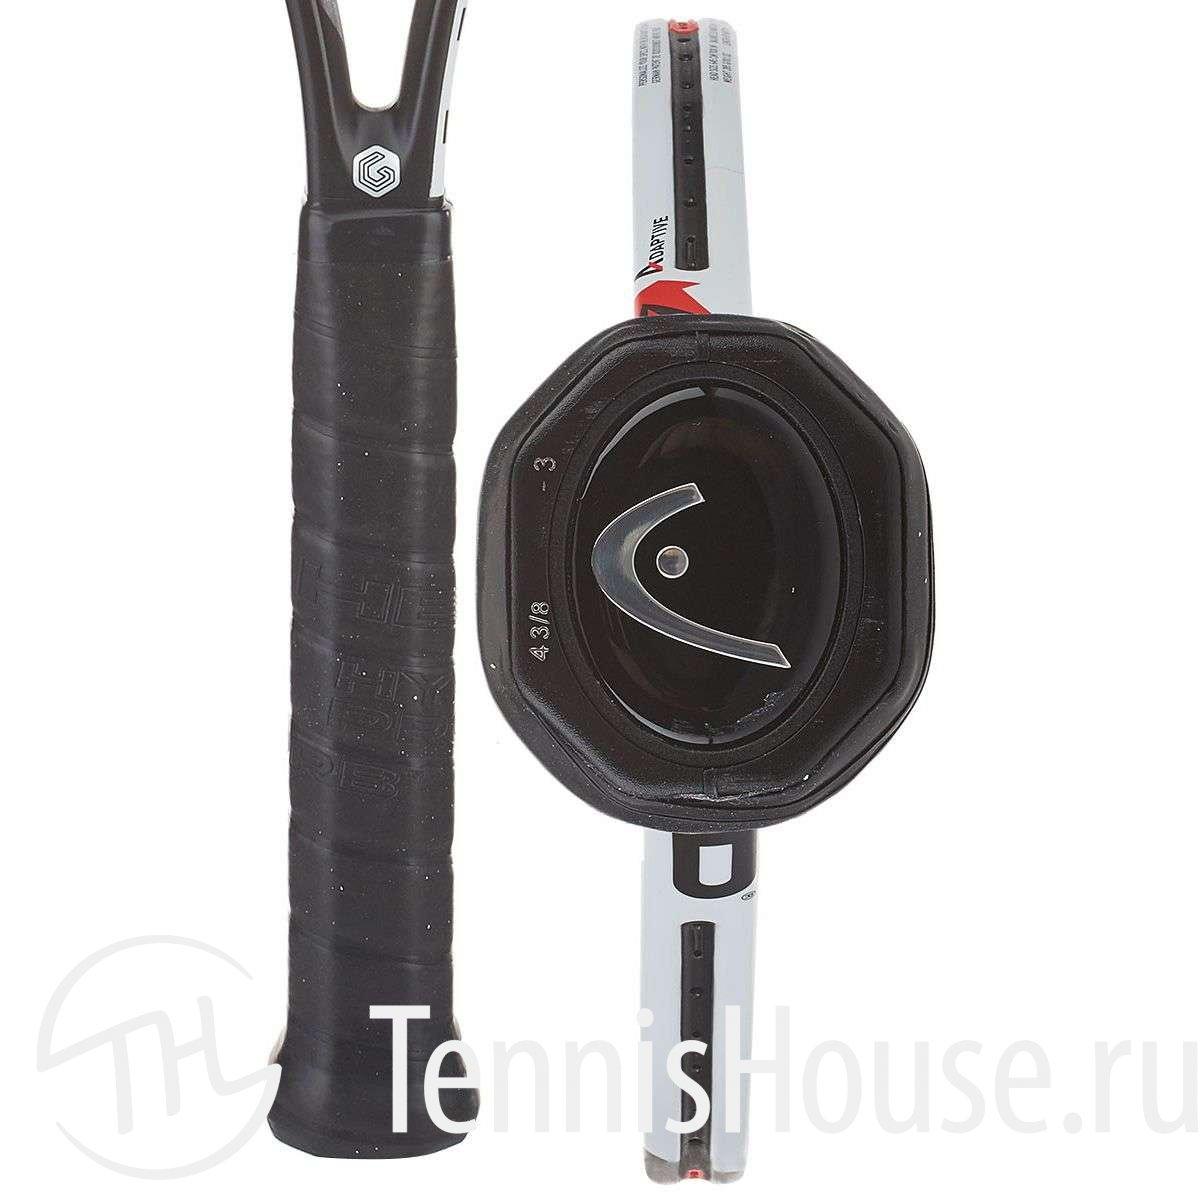 HEAD Graphene Touch Speed Pro 231807